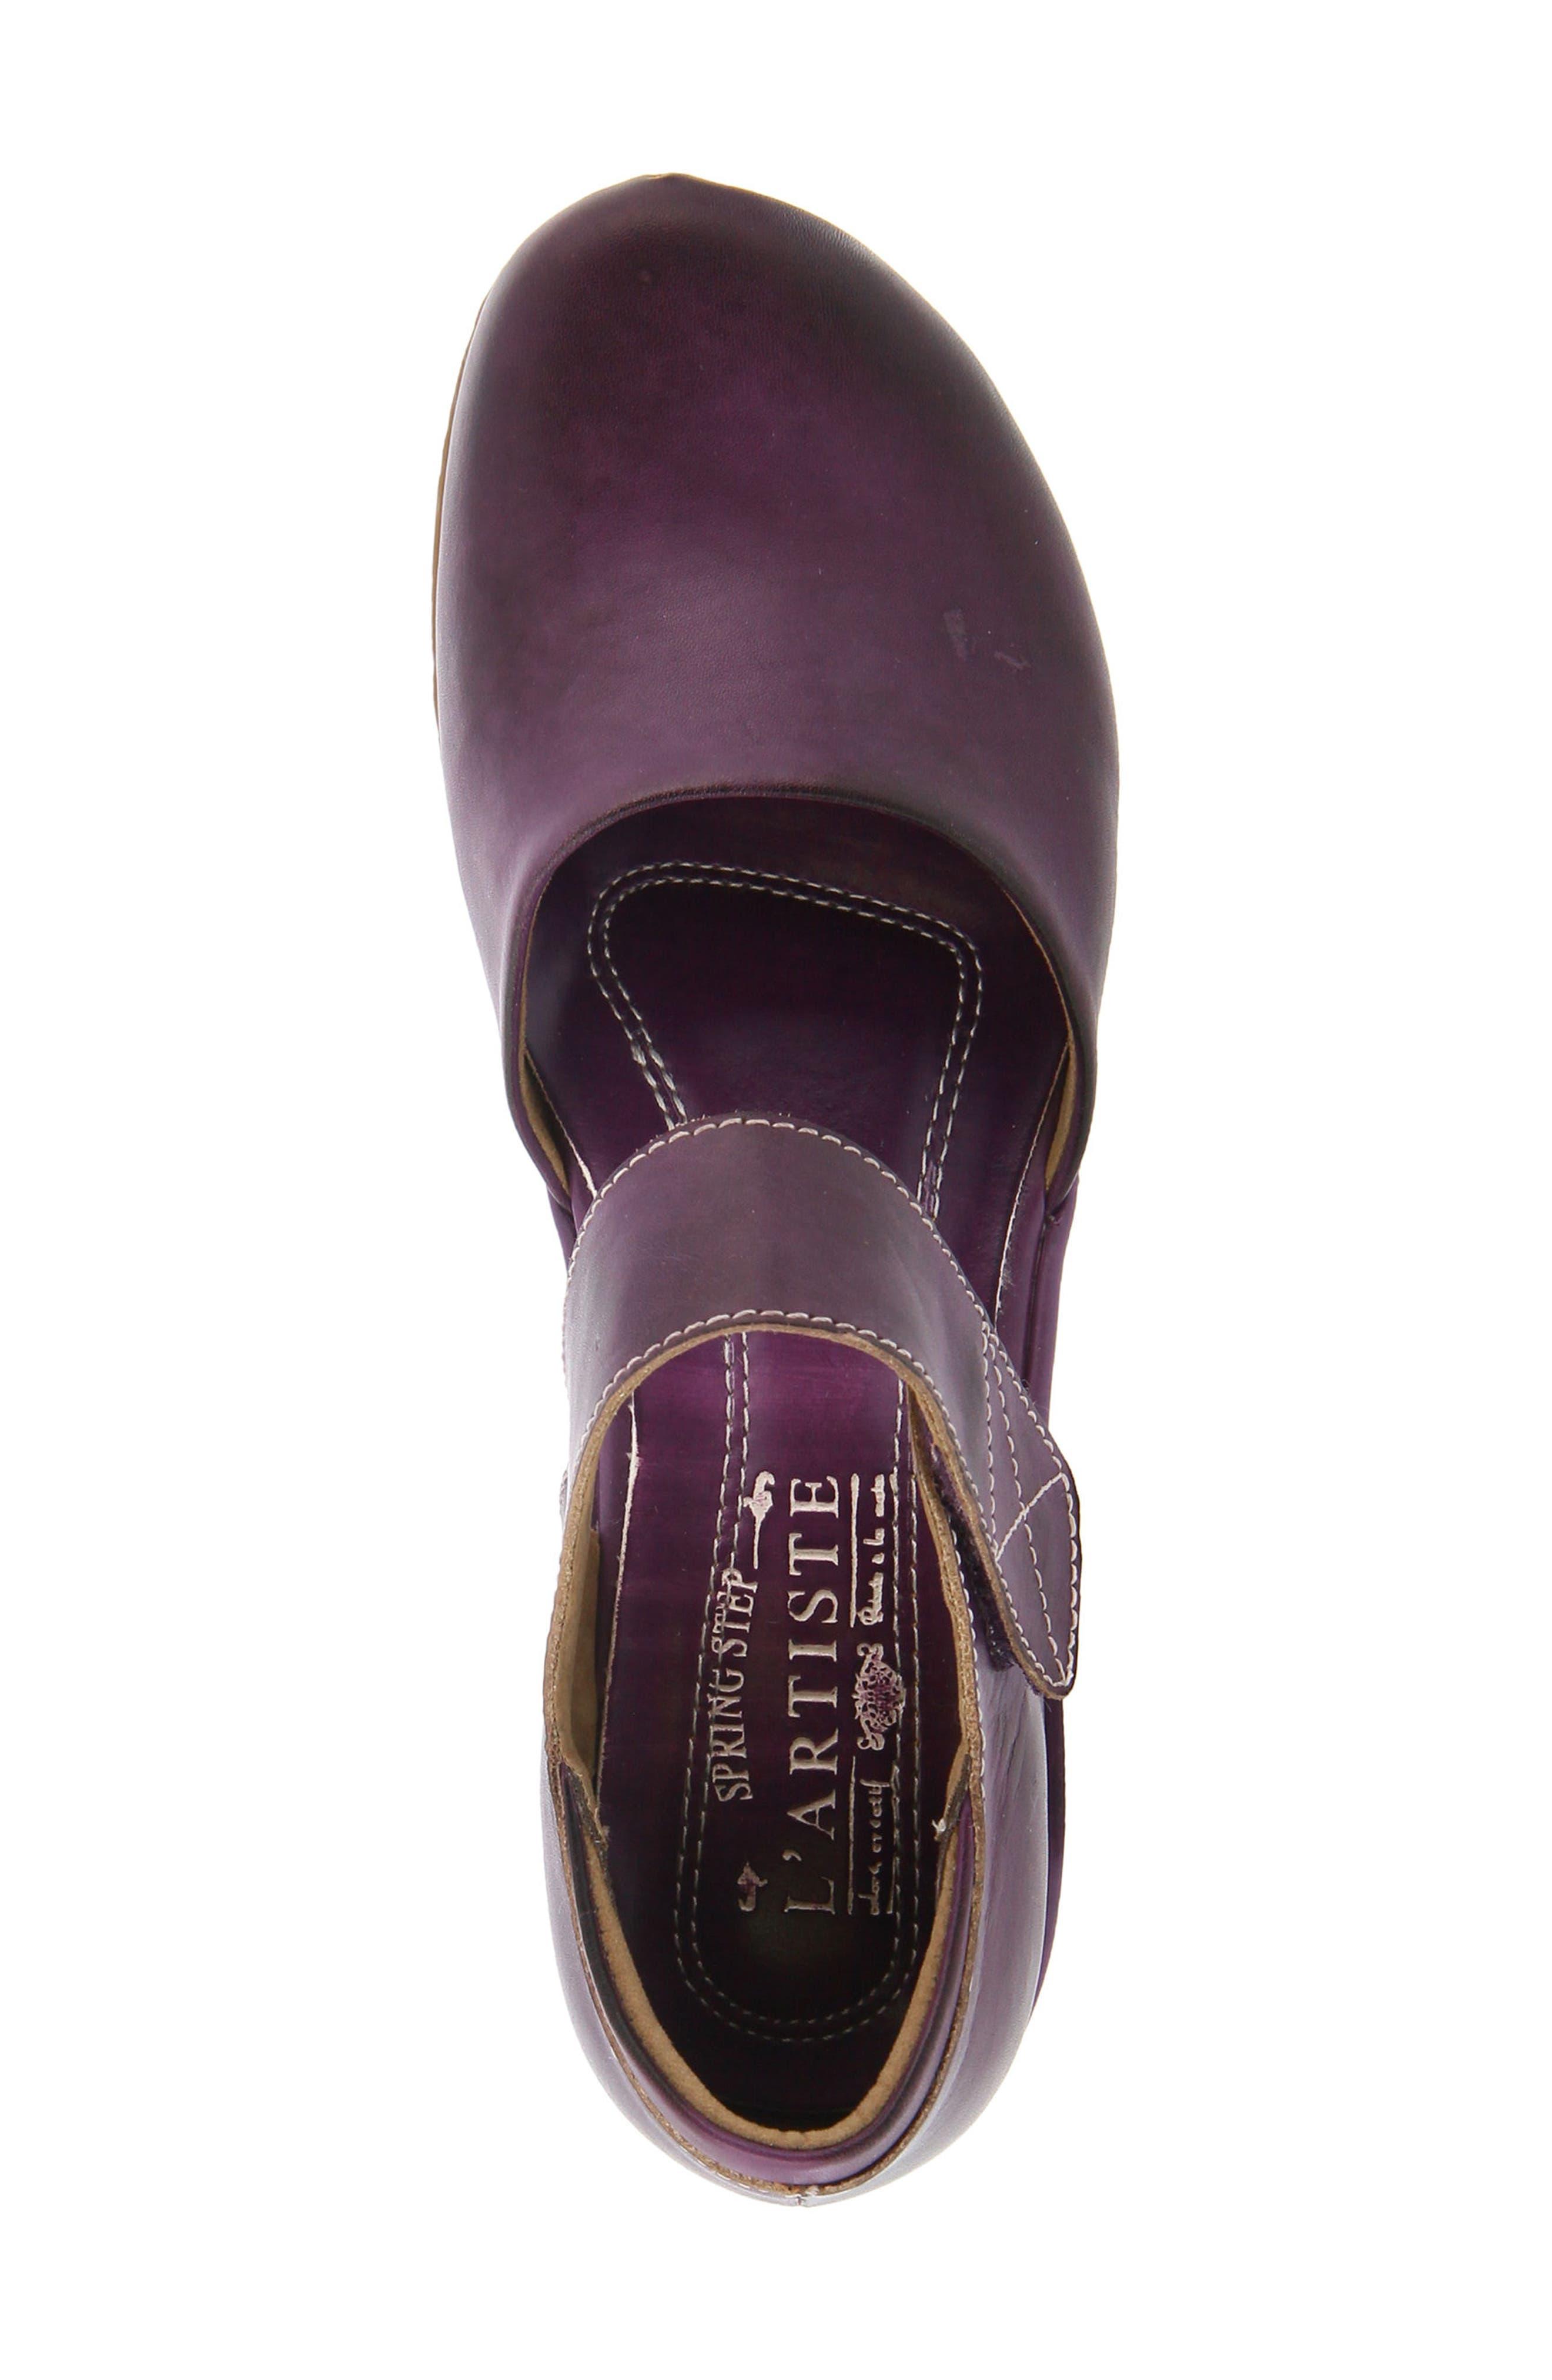 L'Artiste Gloss Mary Jane Pump,                             Alternate thumbnail 4, color,                             Purple Leather